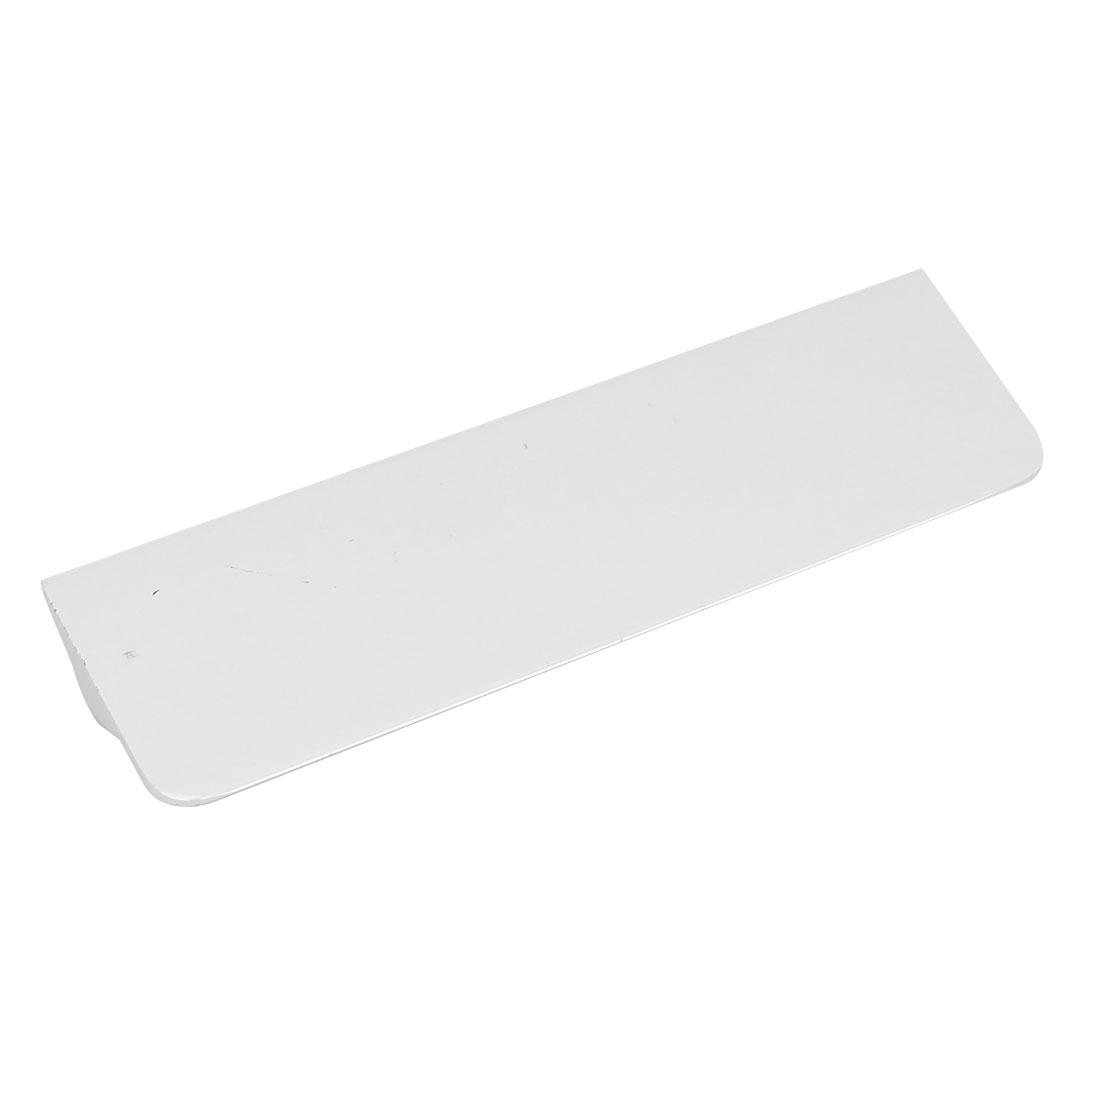 Cupboard Wardrobe Door Metal Pull Handle Knob White 139x35x20mm